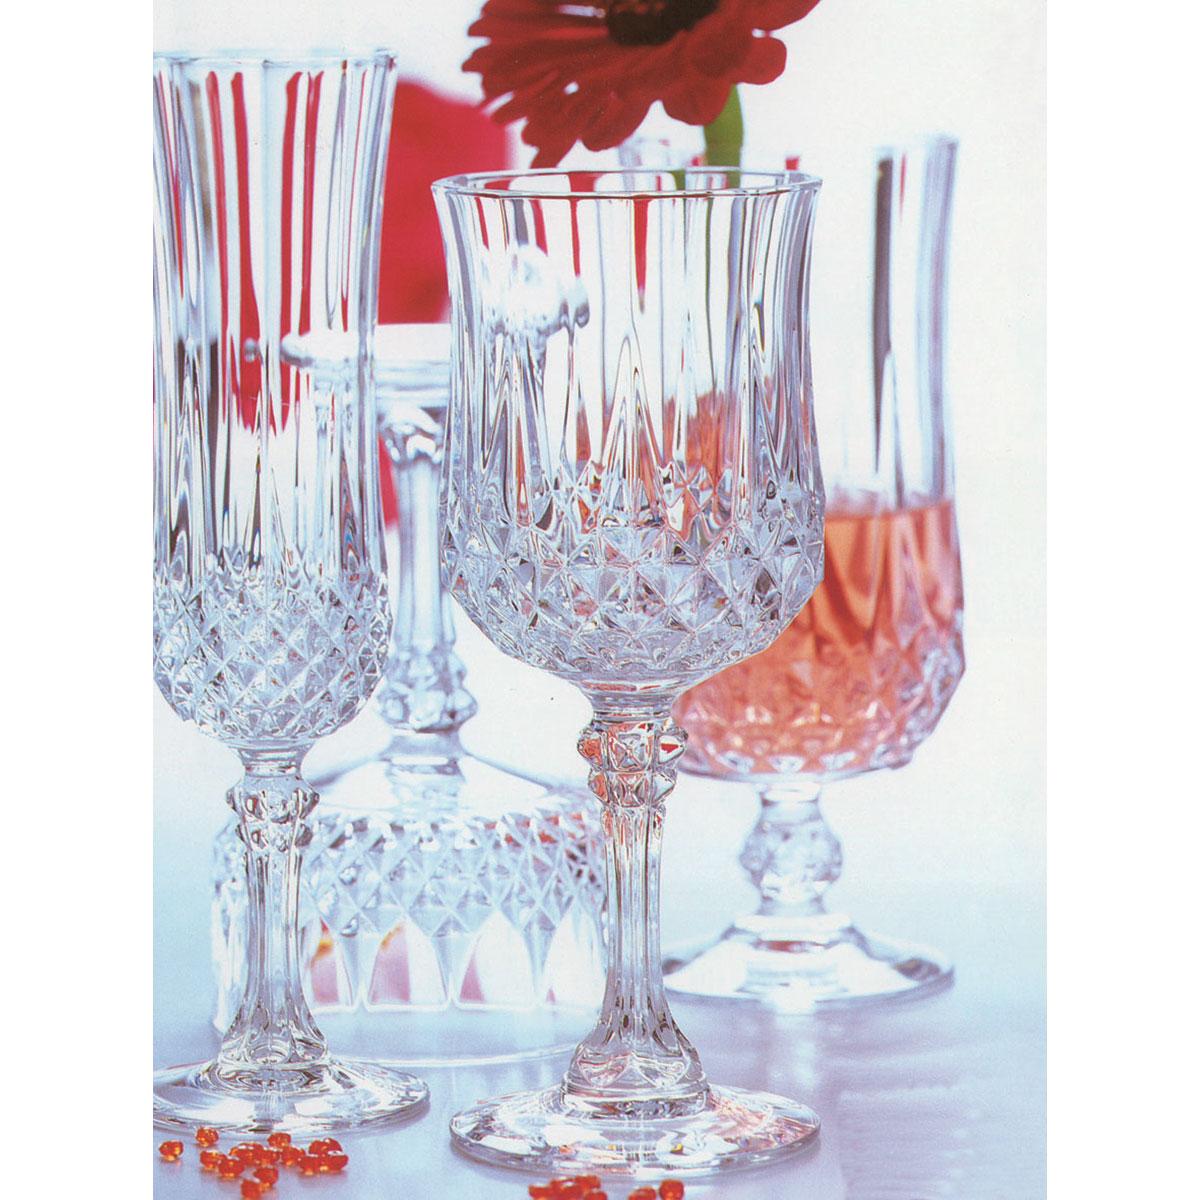 cristal d 39 arques g5186 6 verres pied longchamp 25 cl. Black Bedroom Furniture Sets. Home Design Ideas